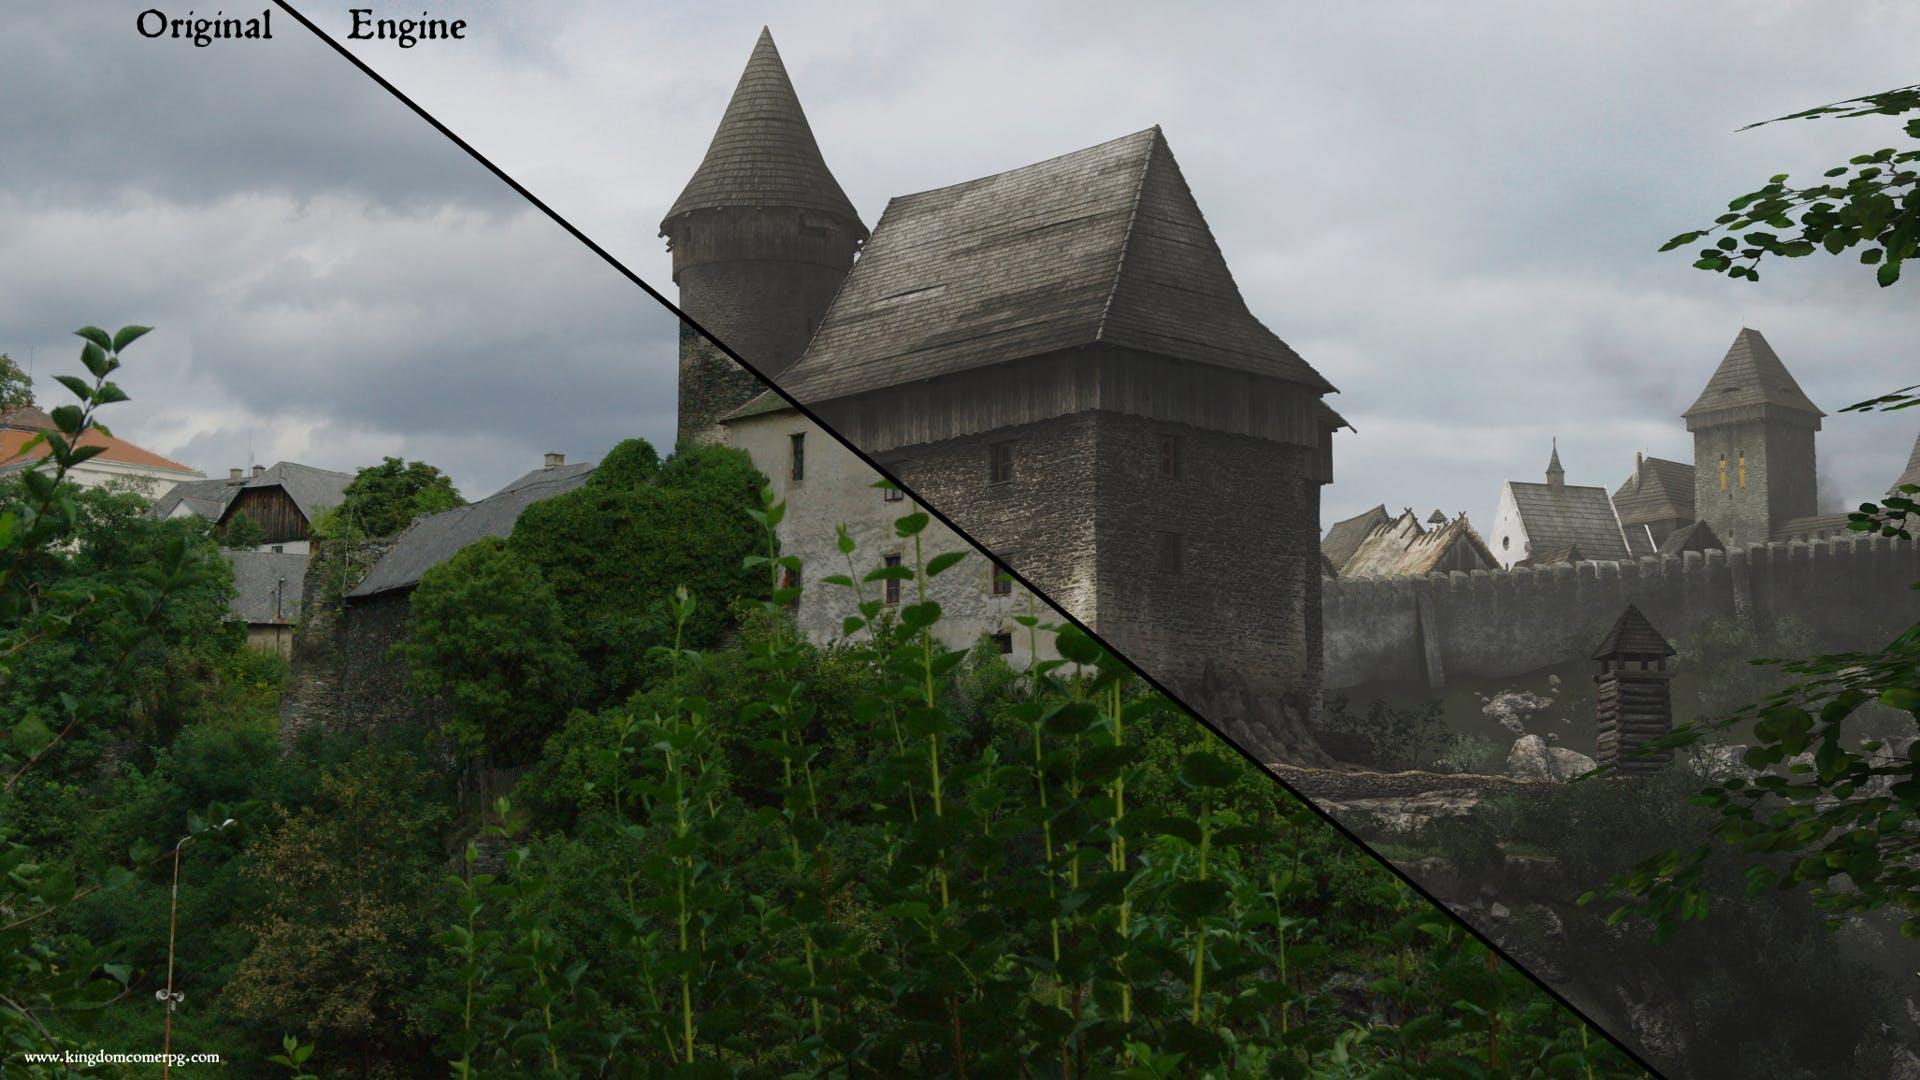 https://images.prismic.io/fanatical/52a3ab706756b4628e23b2f21b398815773c114b_screenshot_17_castle_comparison.jpg?auto=compress,format